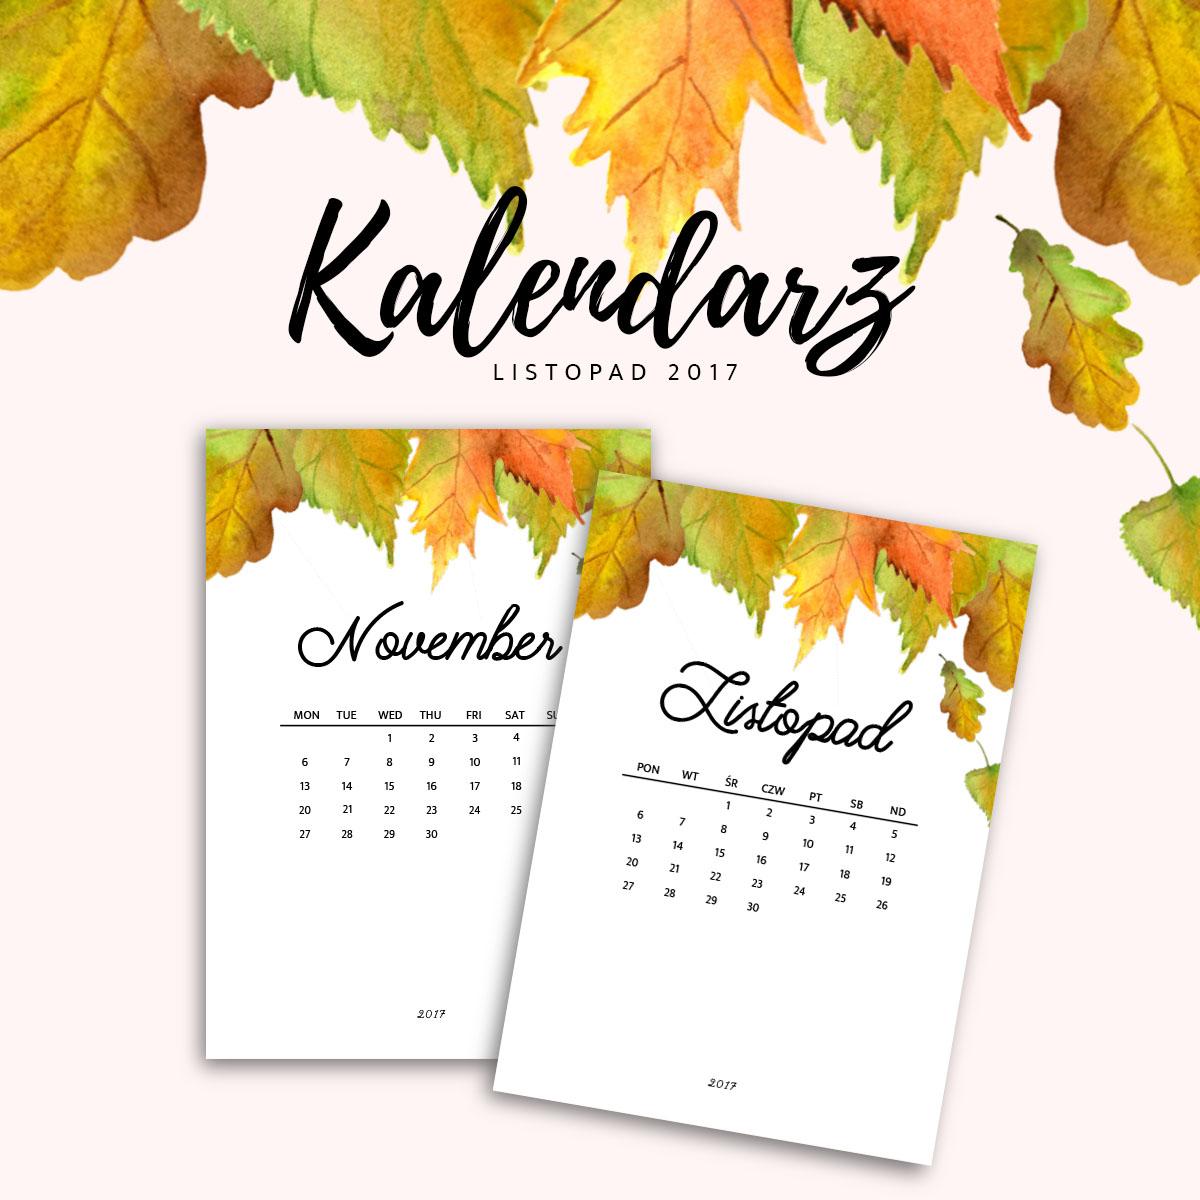 Kalendarz do druku - LISTOPAD 2017 {do pobrania za darmo}